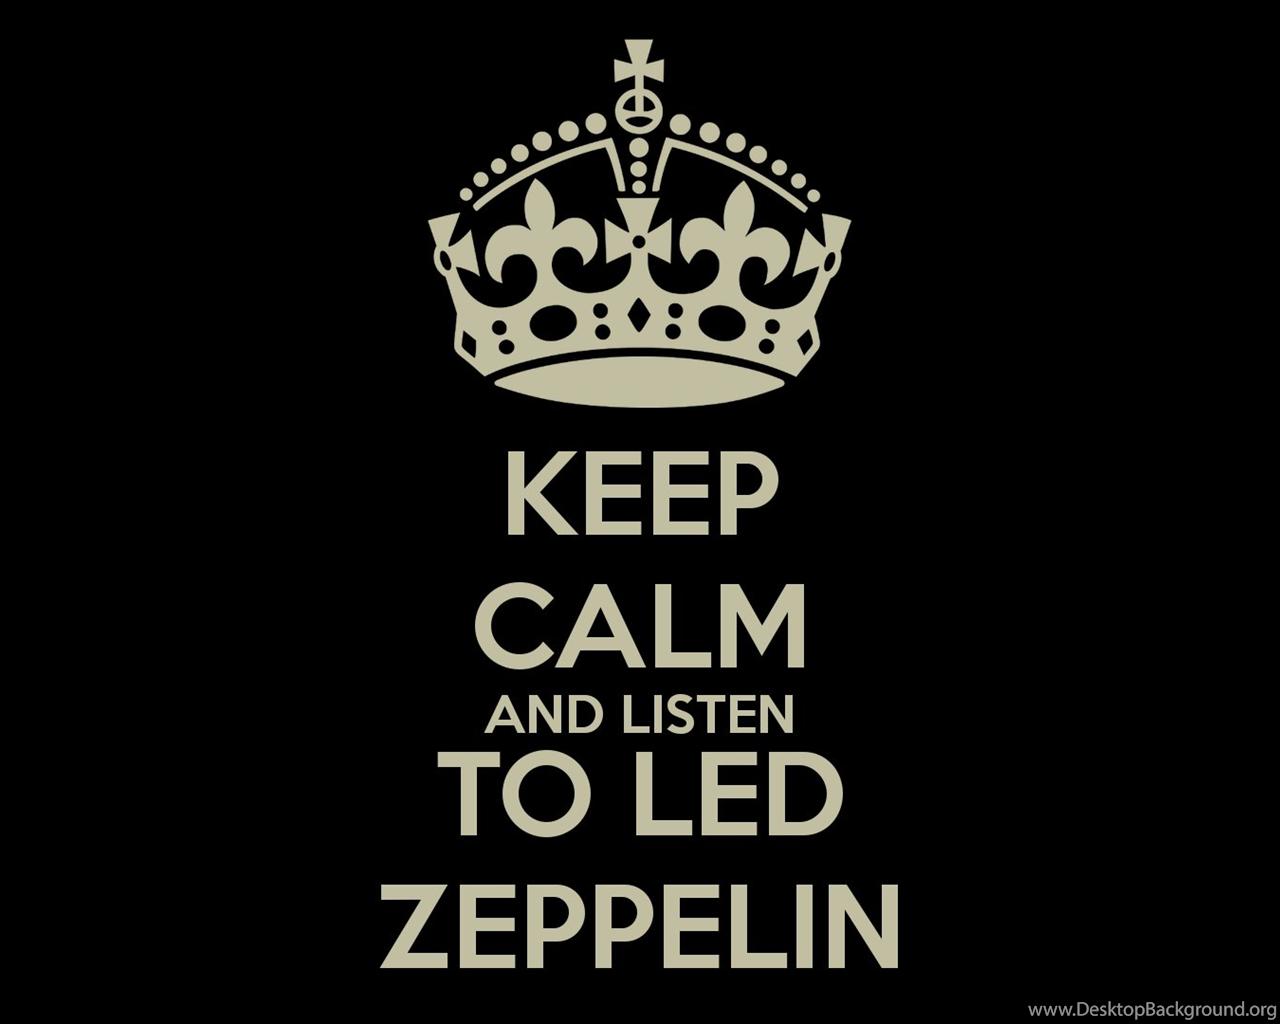 Led Zeppelin Wallpapers 1920x1080 Desktop Background